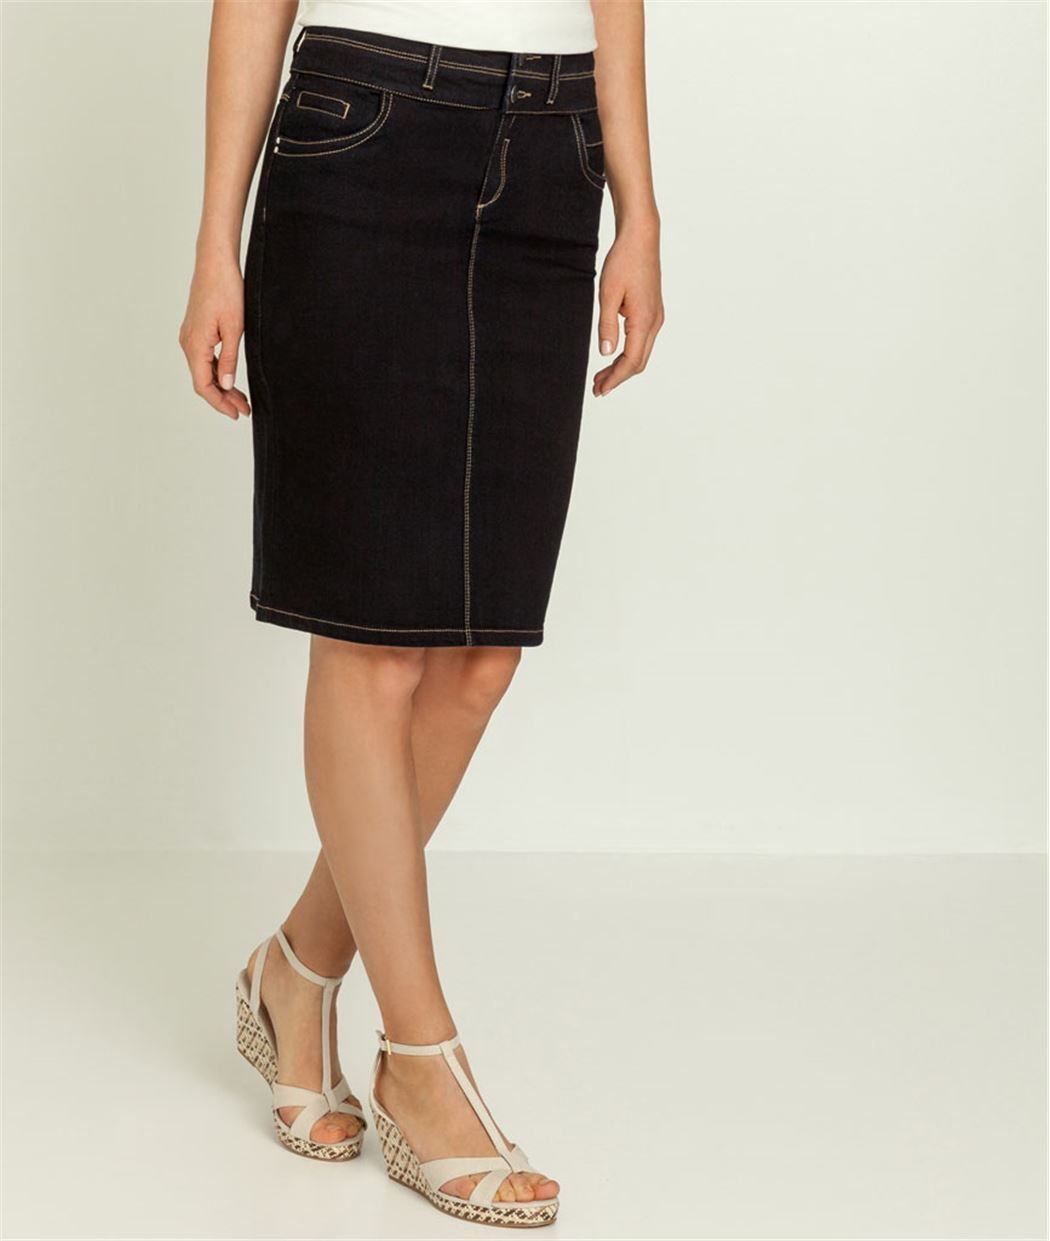 jupe en jean taille haute blue black grain de malice. Black Bedroom Furniture Sets. Home Design Ideas